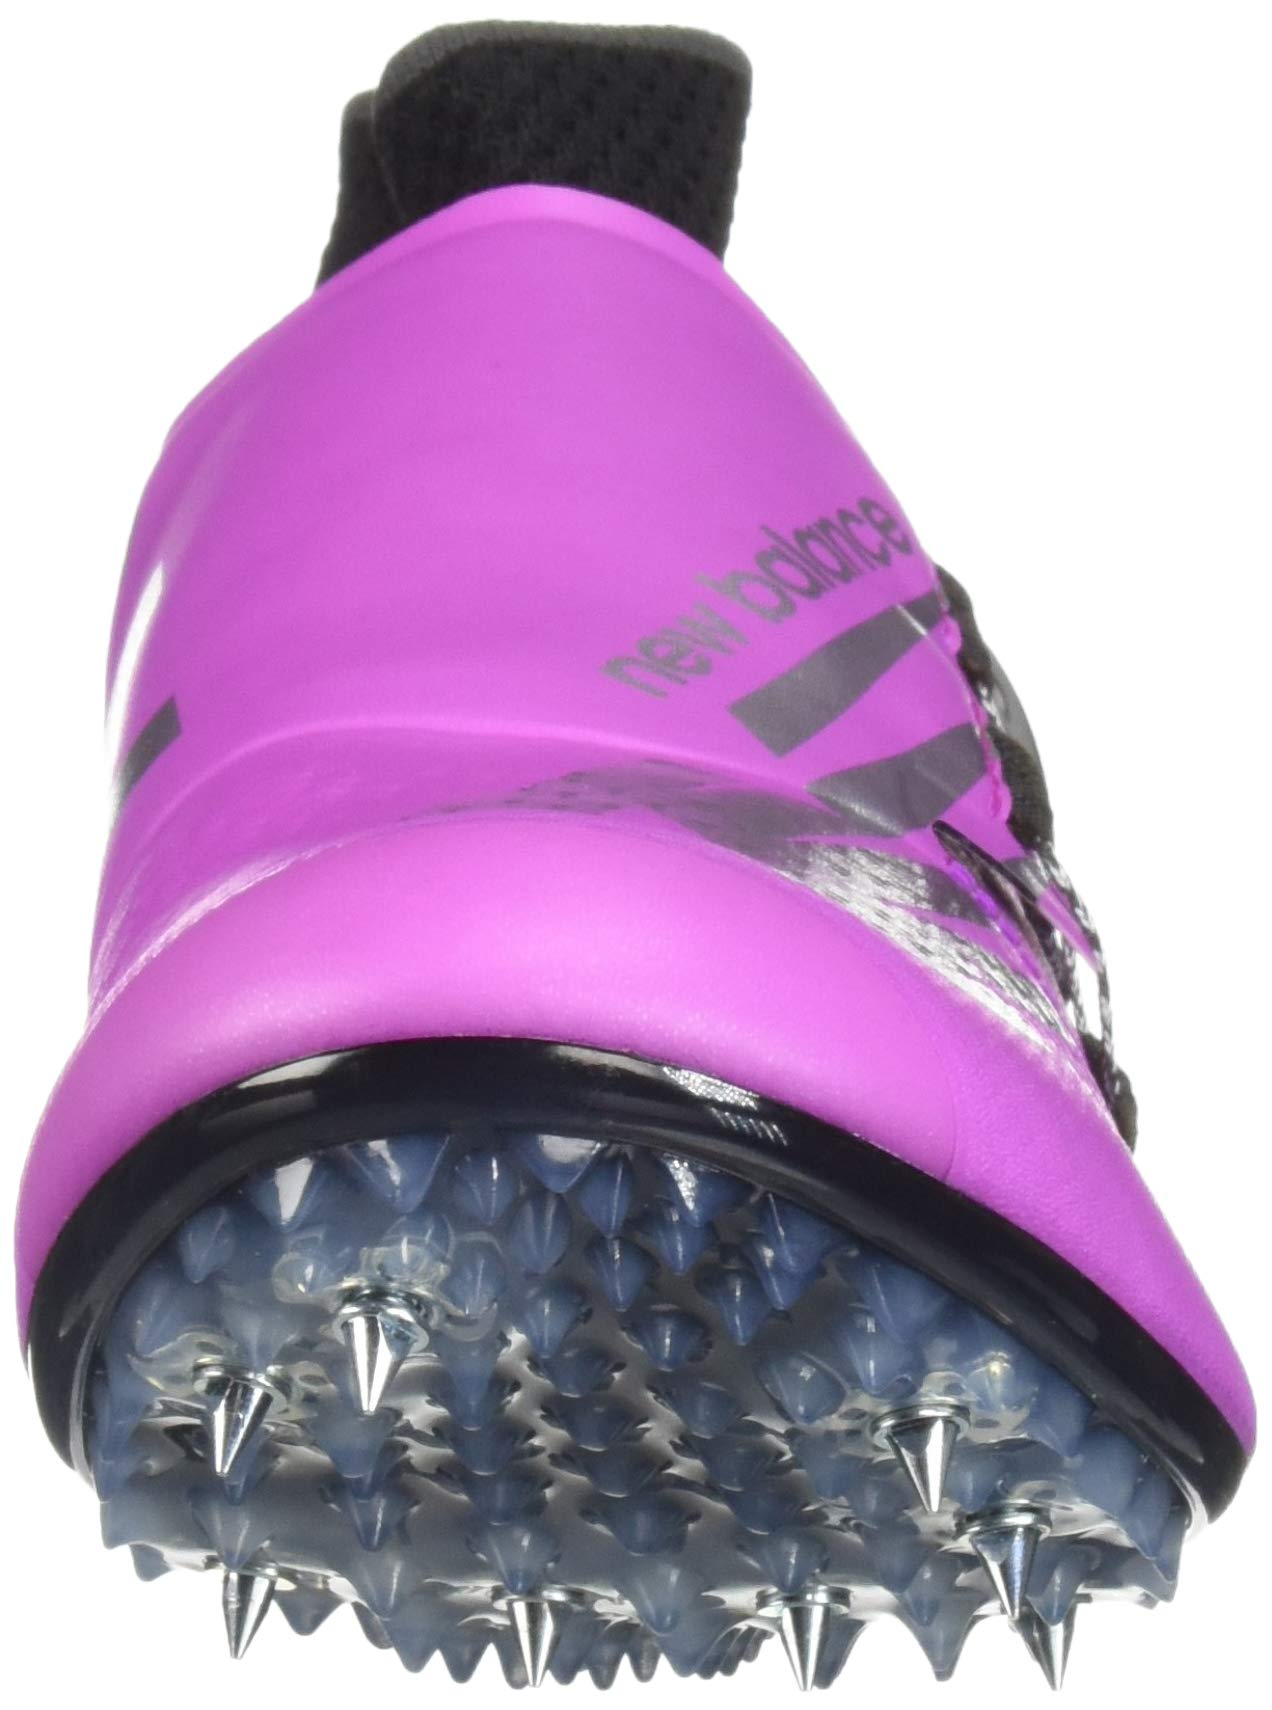 New Balance Men's Sigma Harmony Vazee Track Shoe Voltage Violet/Black 4.5 D US by New Balance (Image #4)